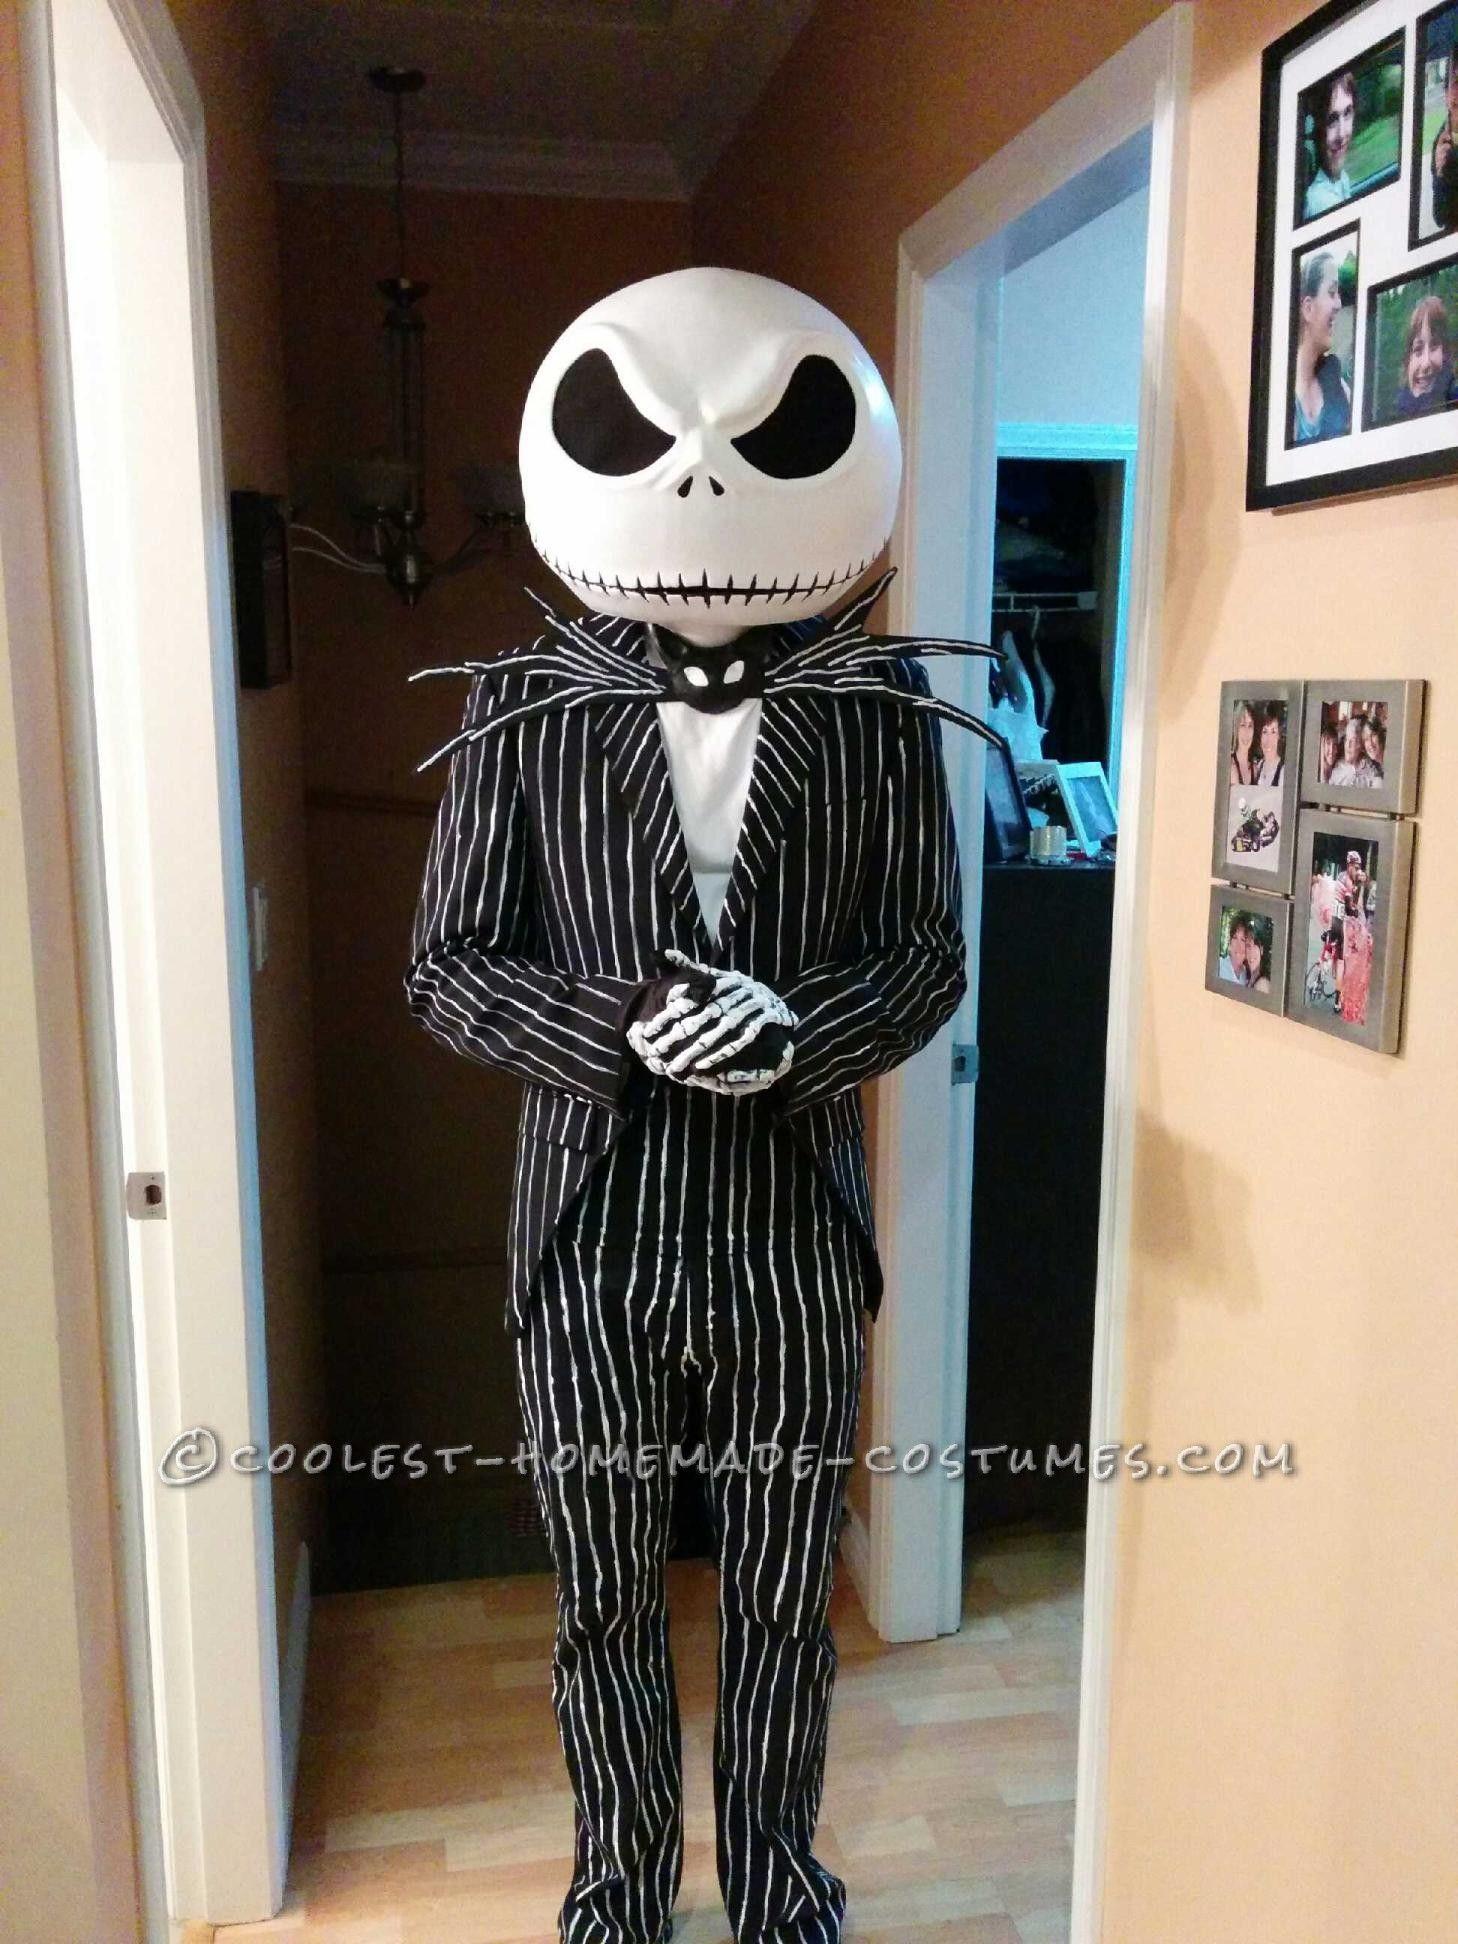 Best ideas about Jack Skellington DIY Costume . Save or Pin Amazing Jack Skellington Nightmare Before Christmas Now.